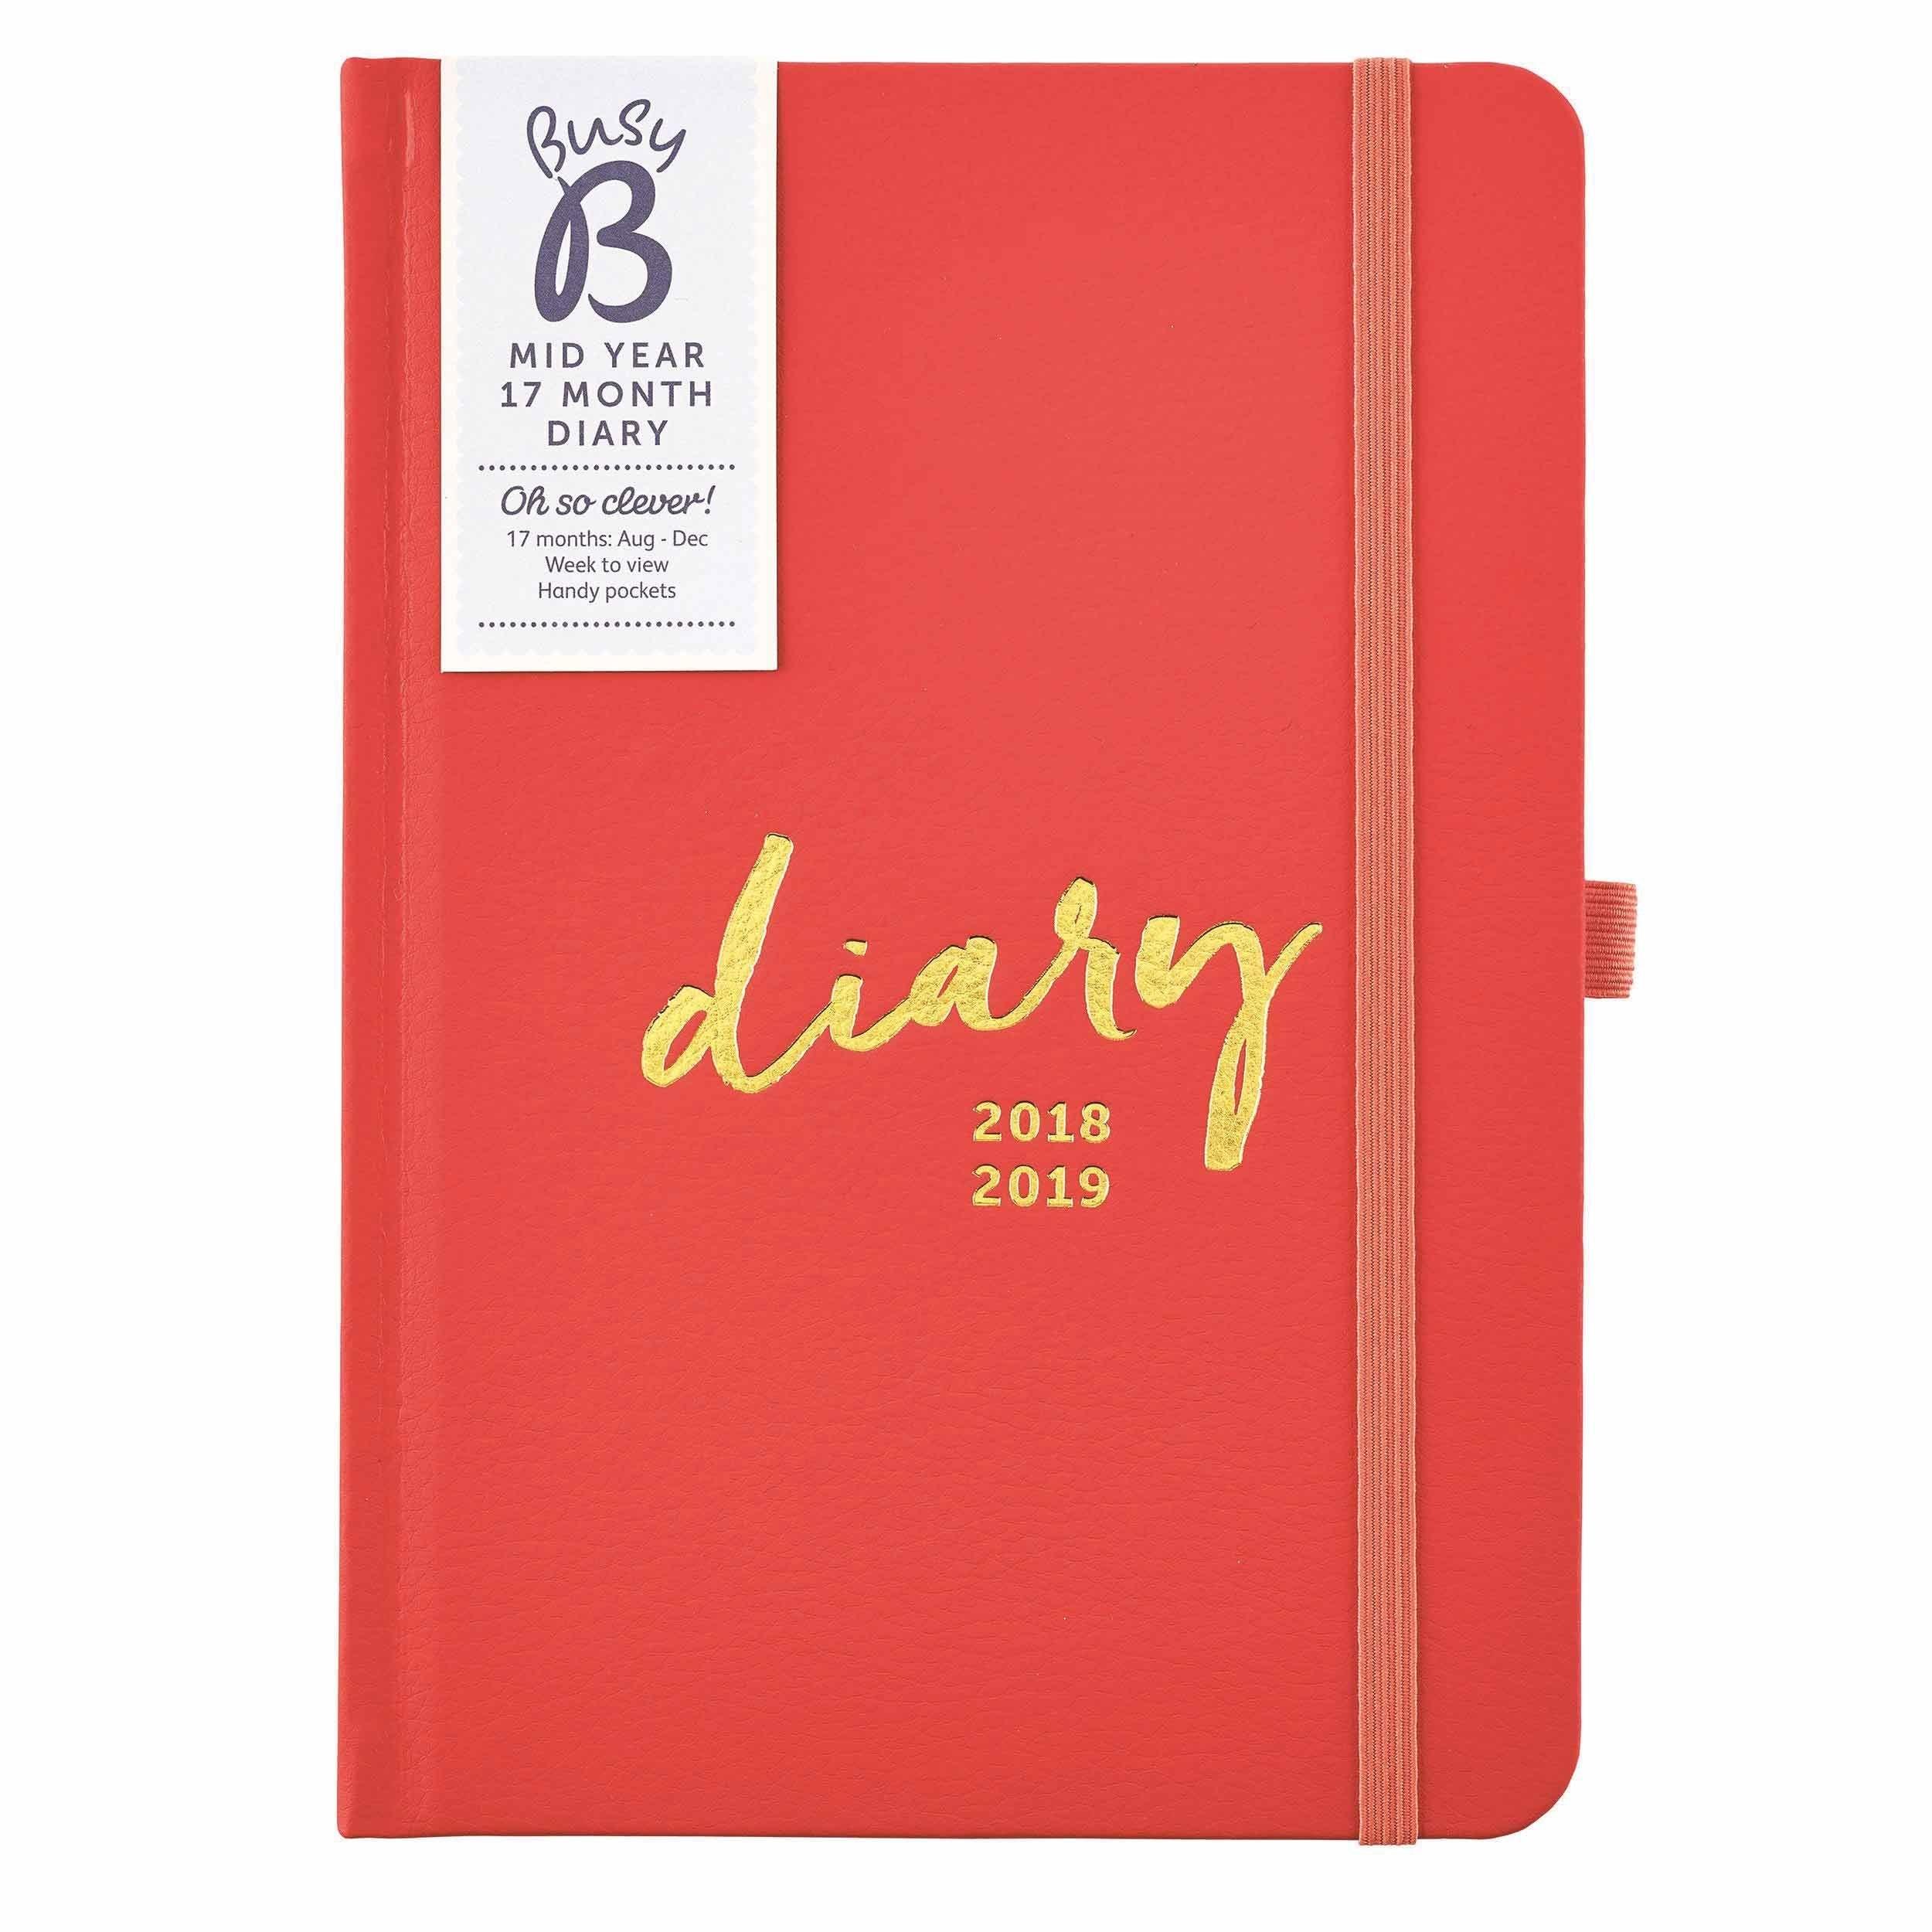 Busy B Mid Year A5 Diary 2018 – 2019 | 2017 Calendars In 2018 Busy B Calendar 2019